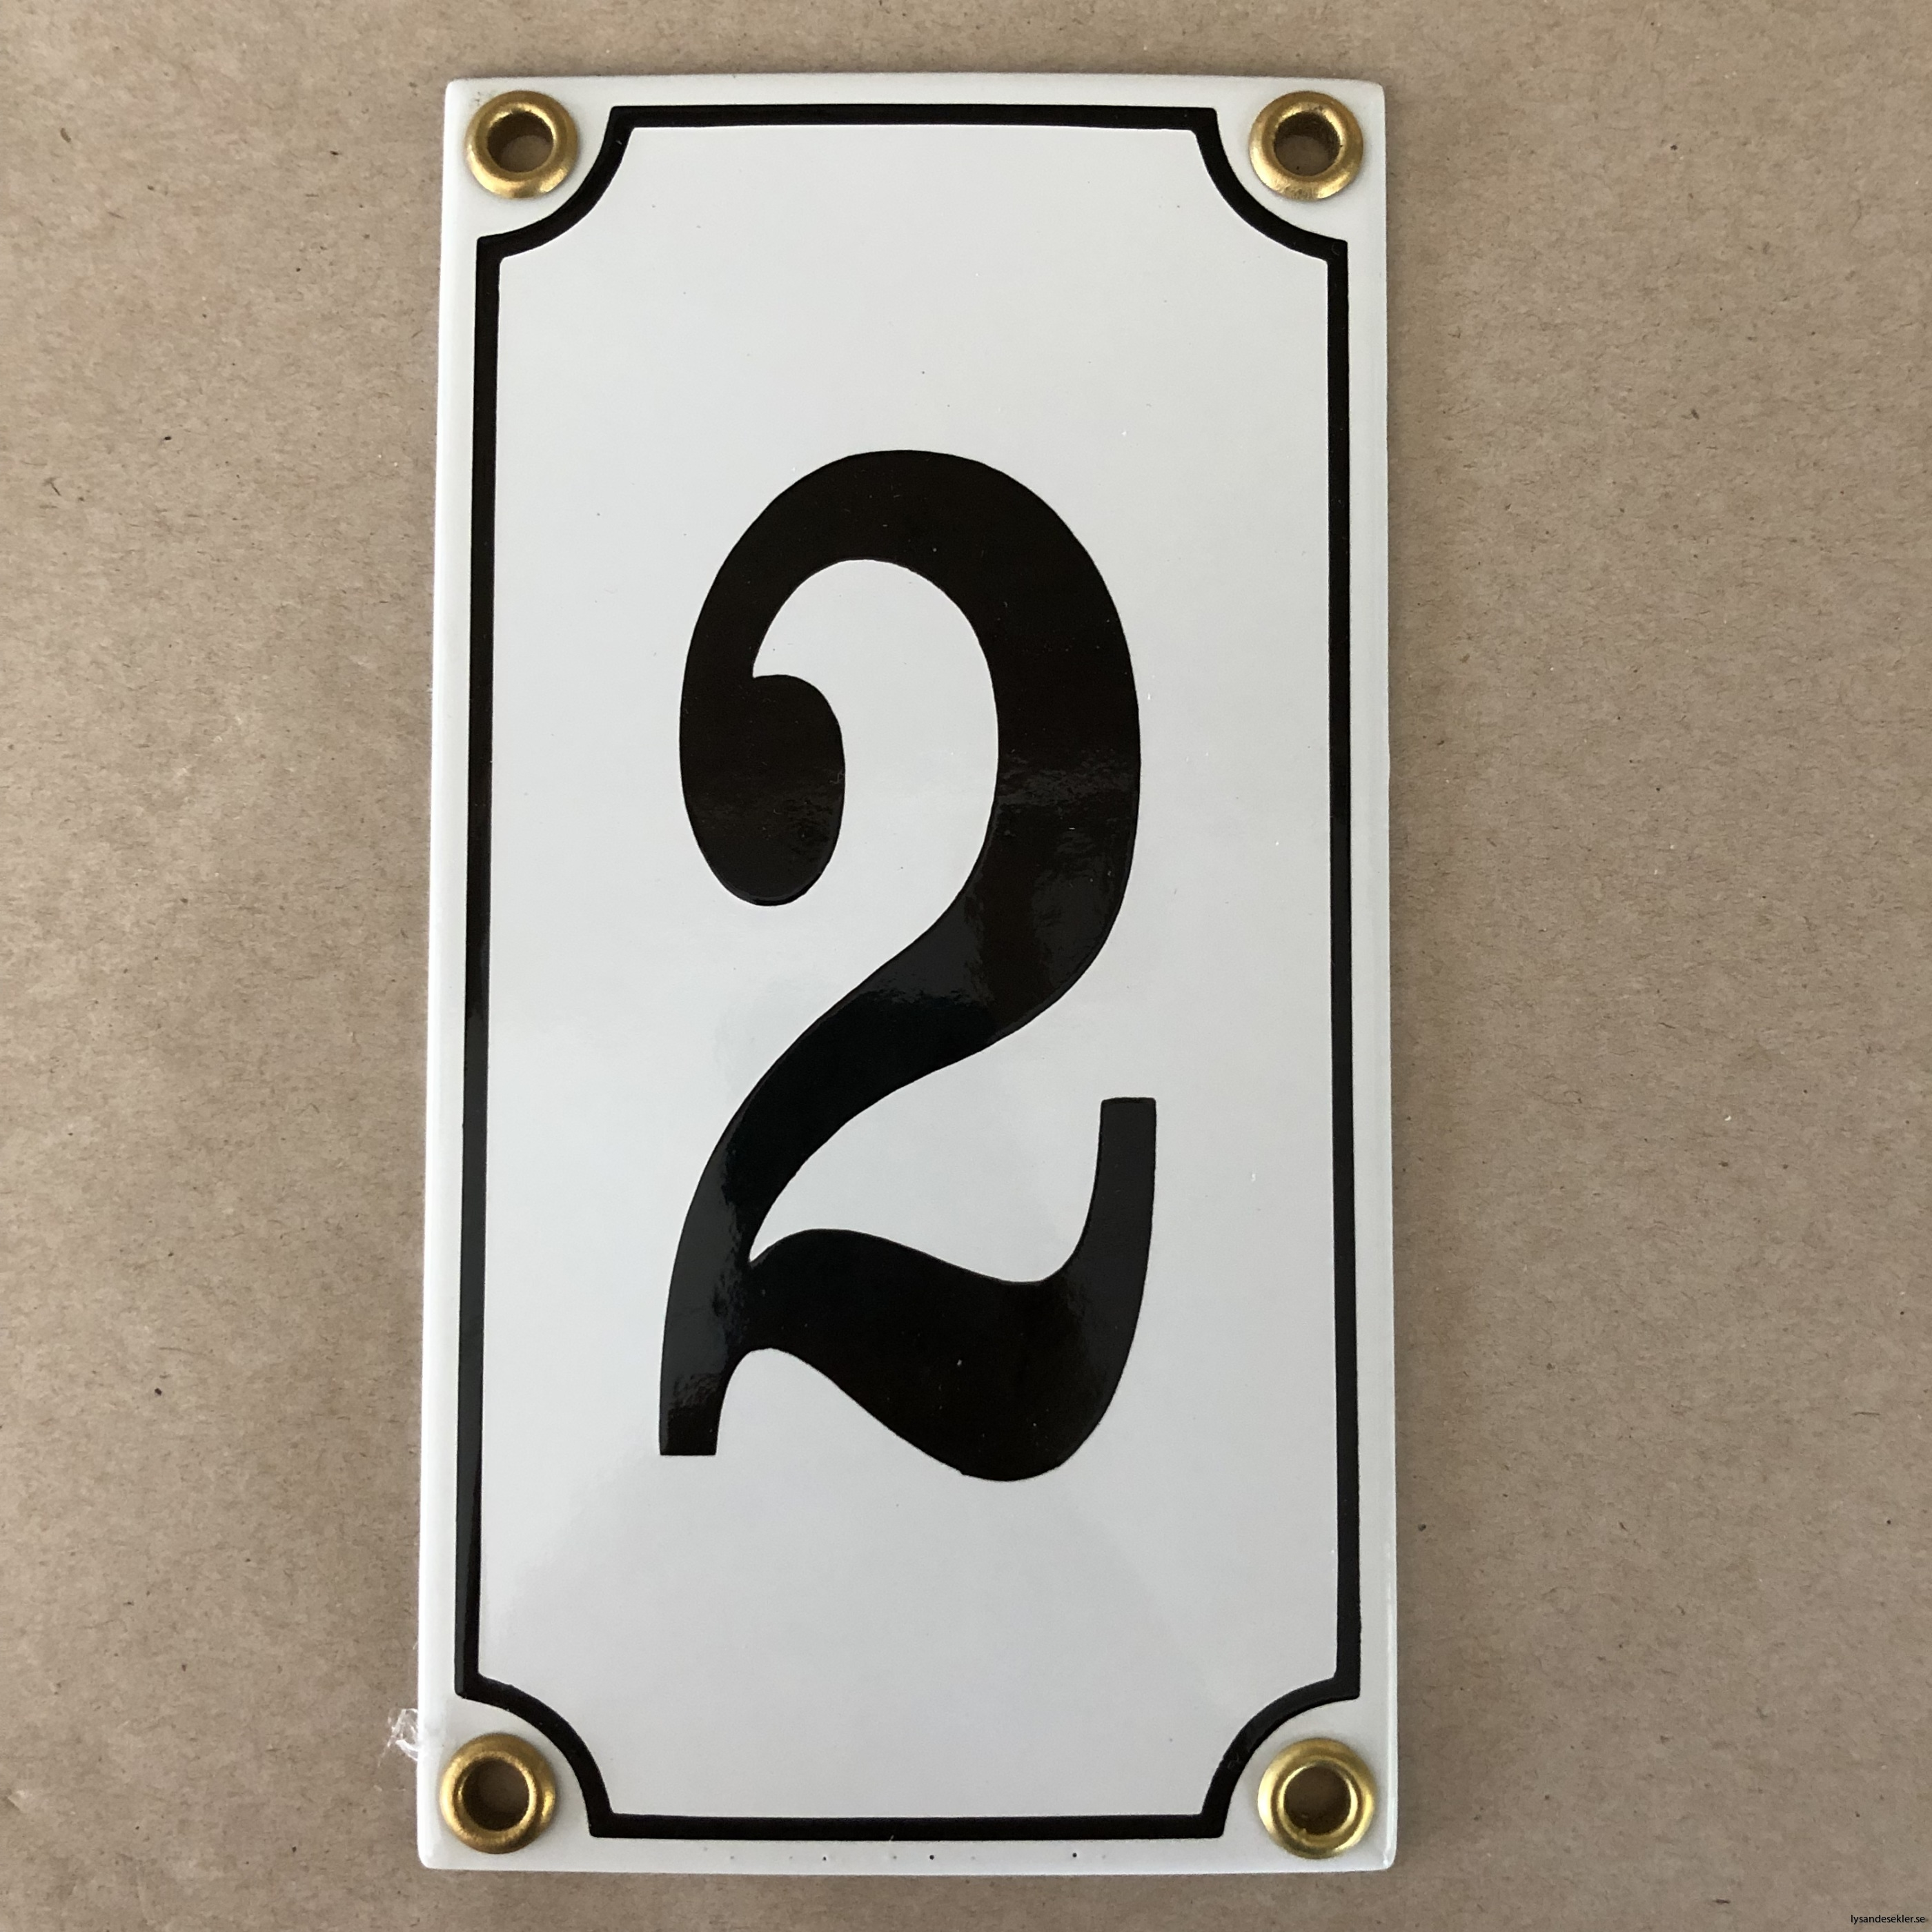 emaljsiffra siffra i emalj fasadsiffra nummer14